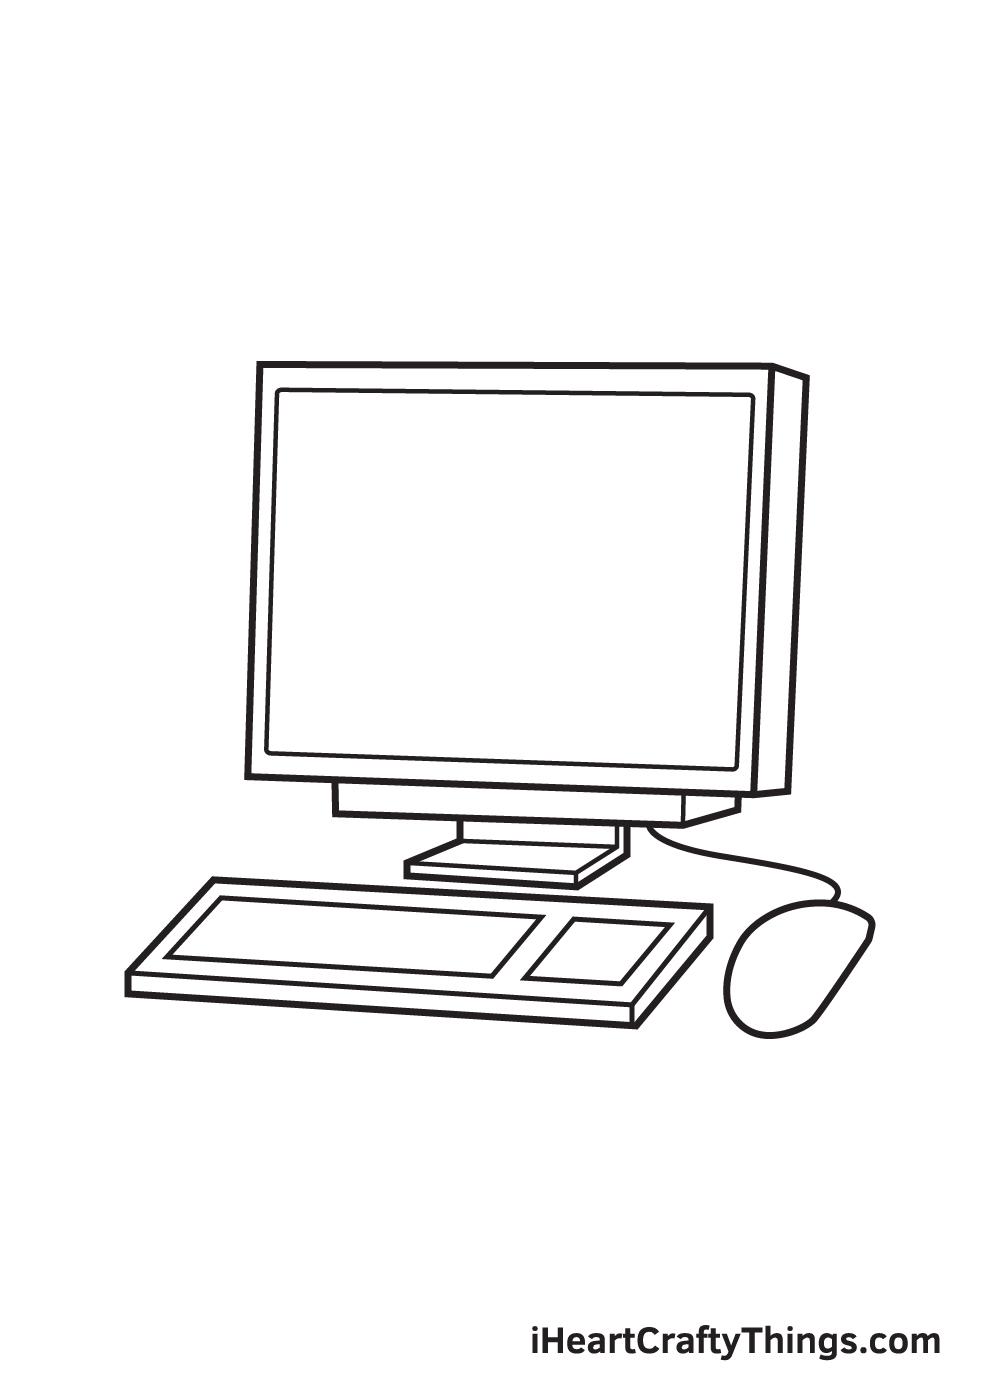 computer drawing - step 6